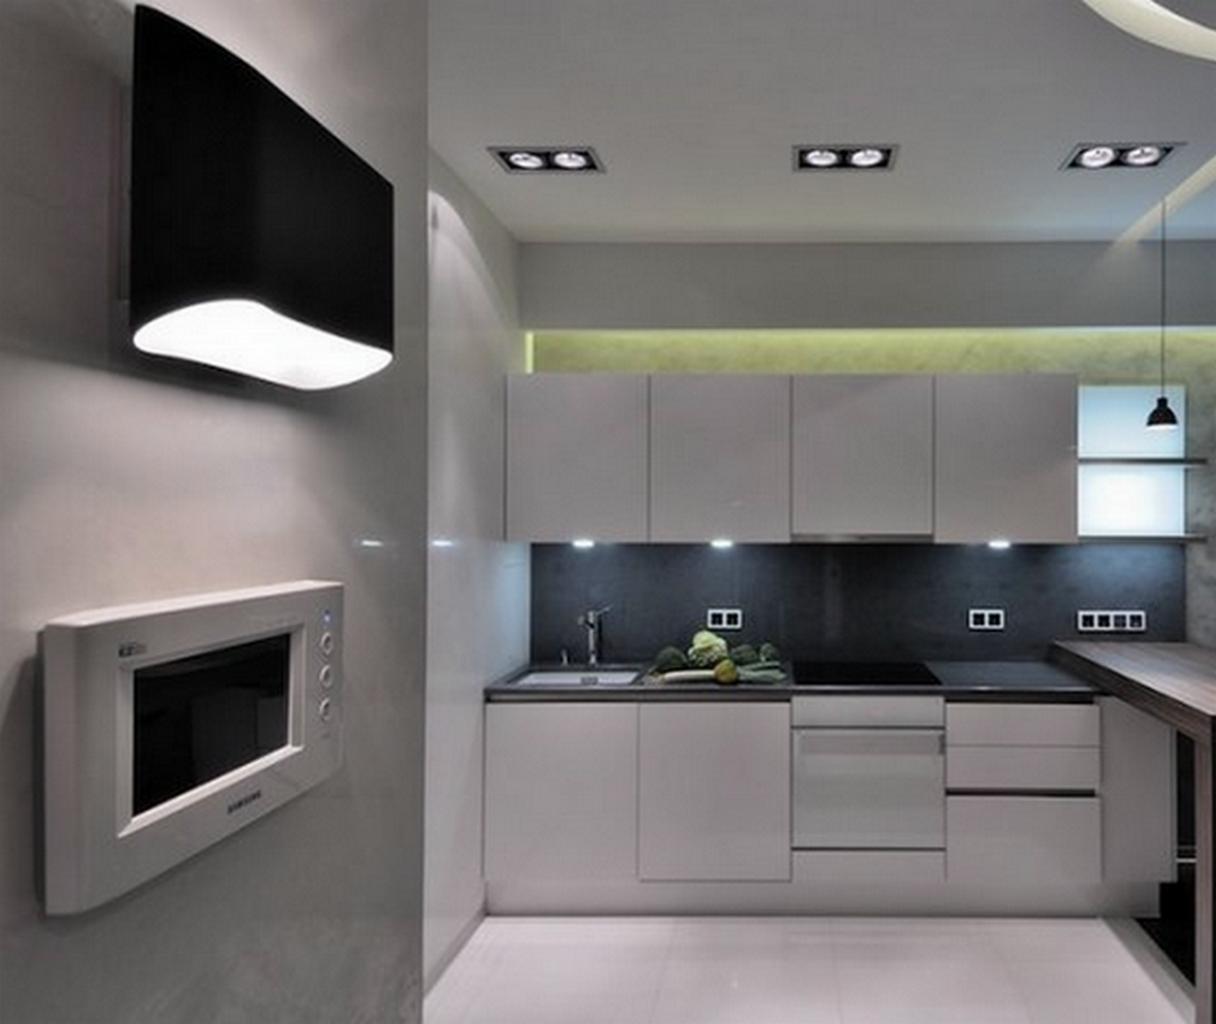 кухня в стиле хай тек фото интерьер фото